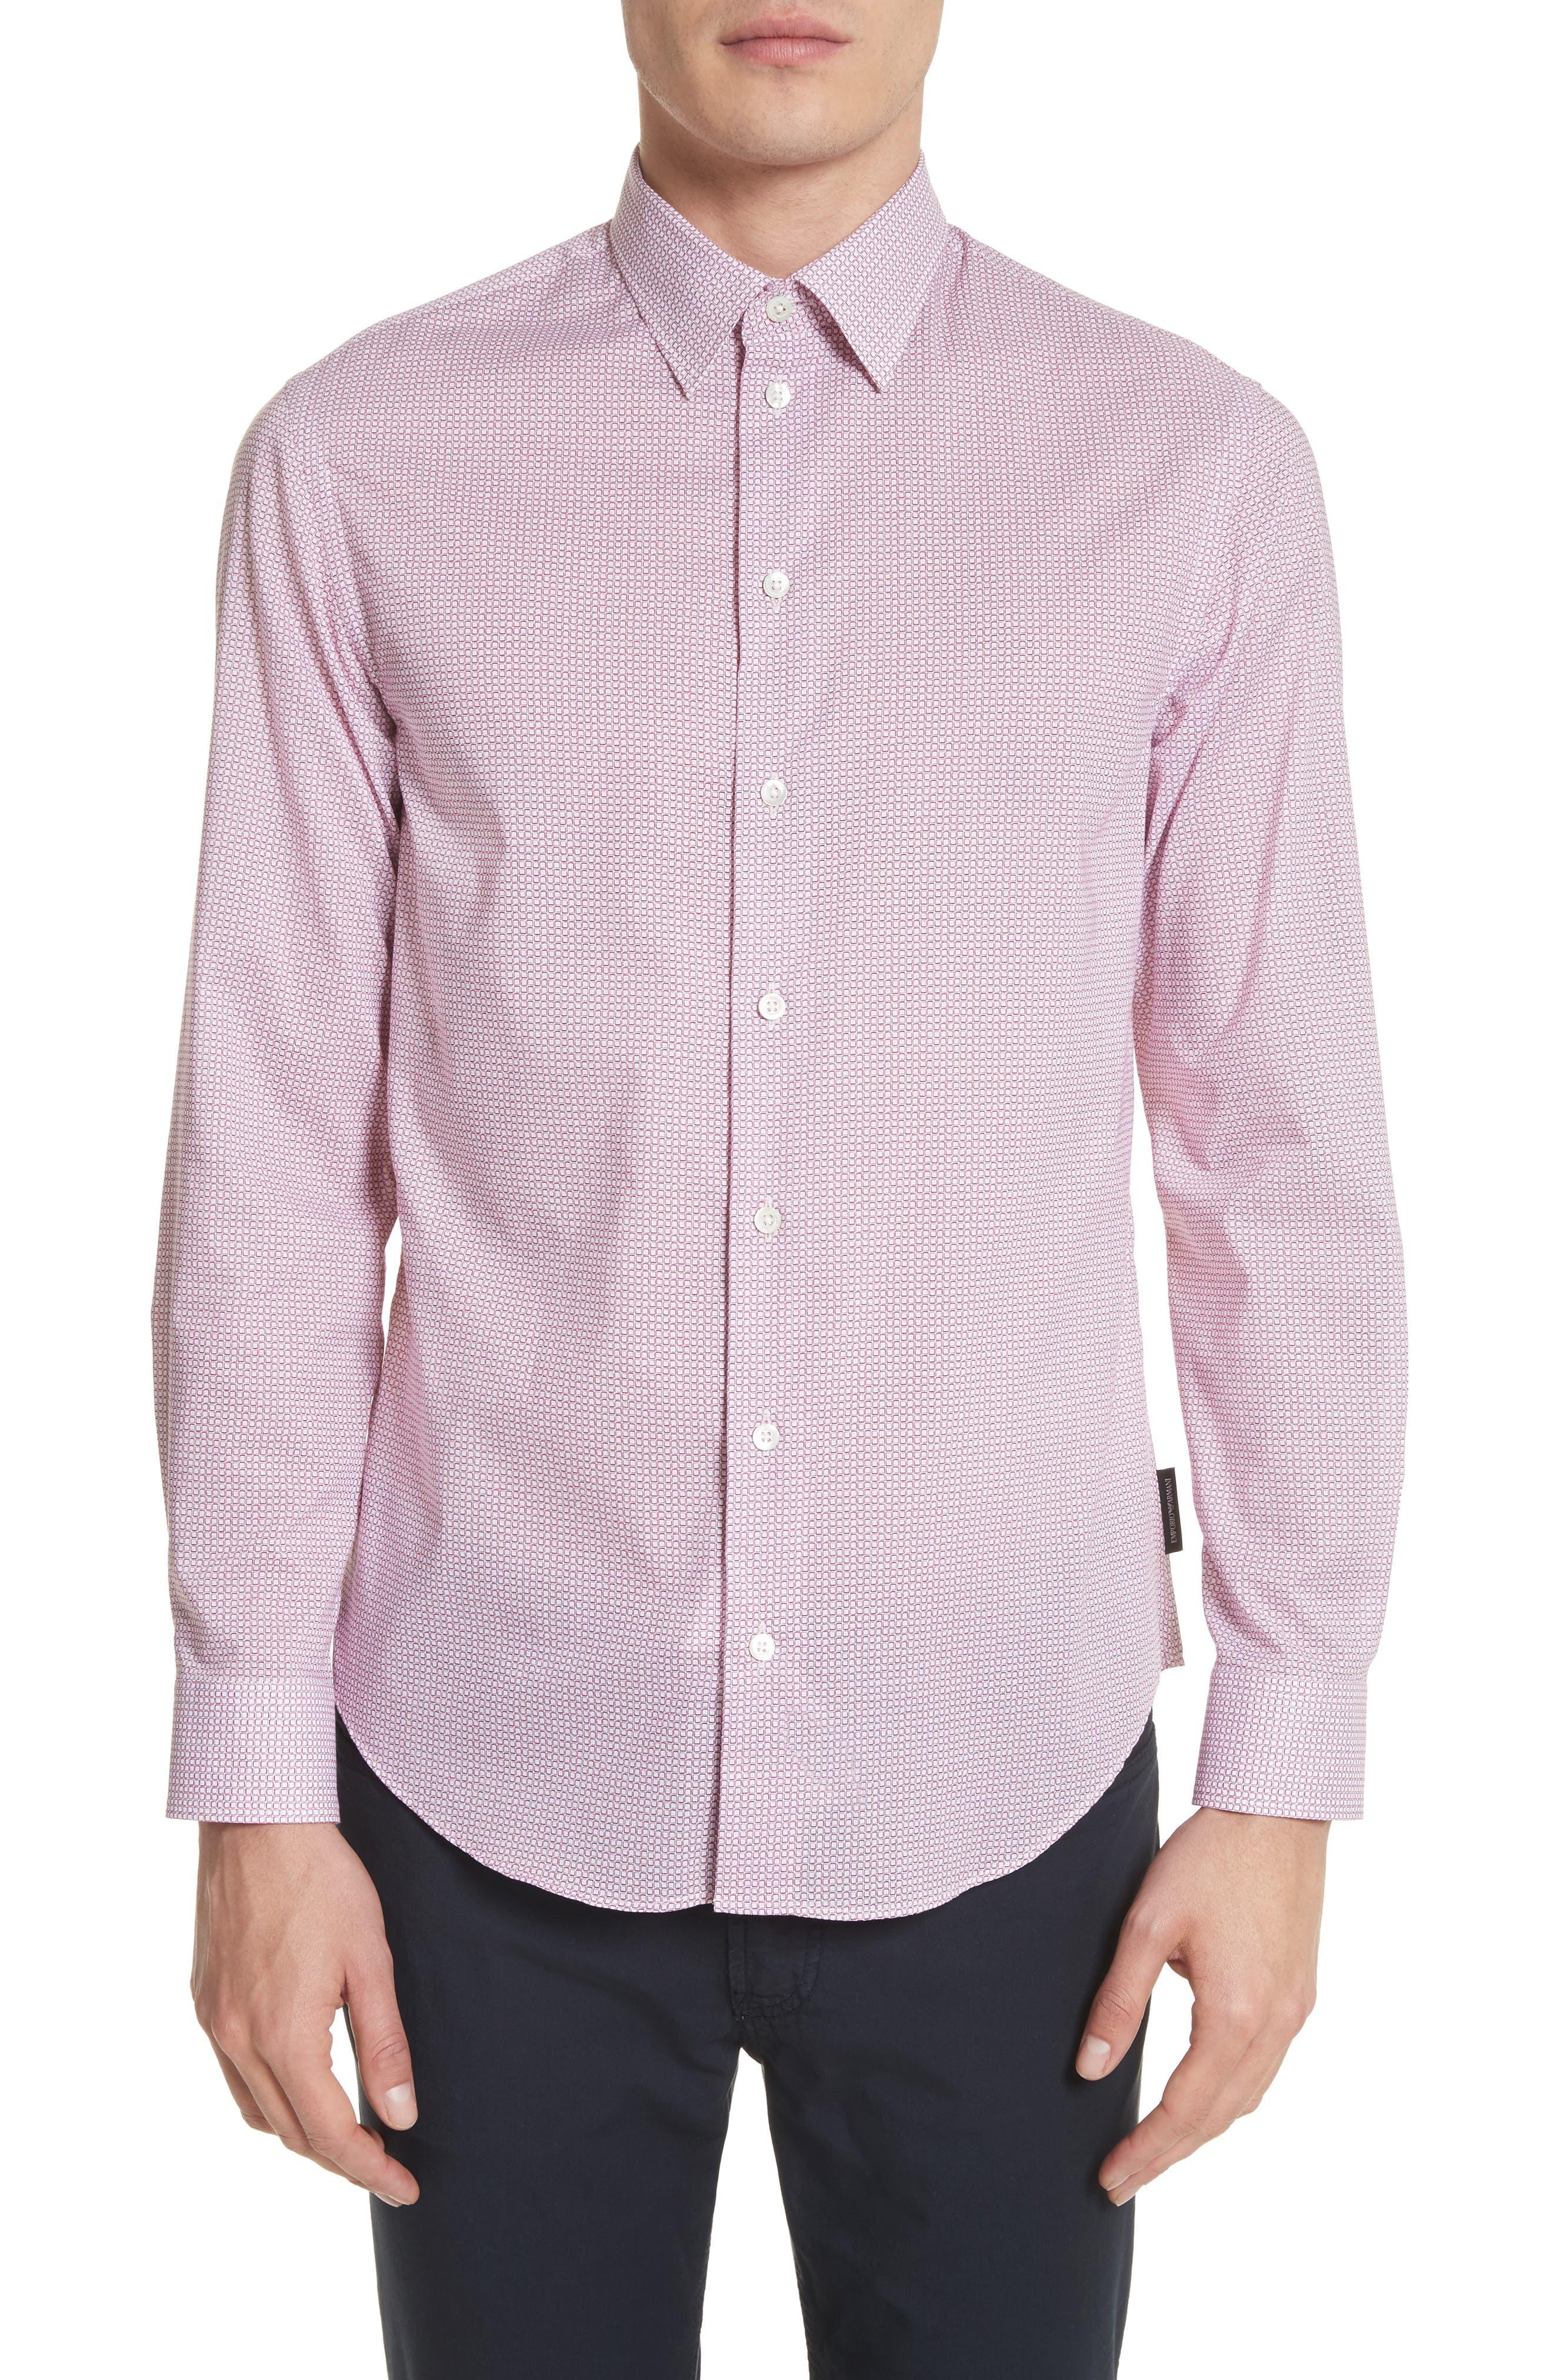 Main Image - Emporio Armani Regular Fit Check Print Sport Shirt